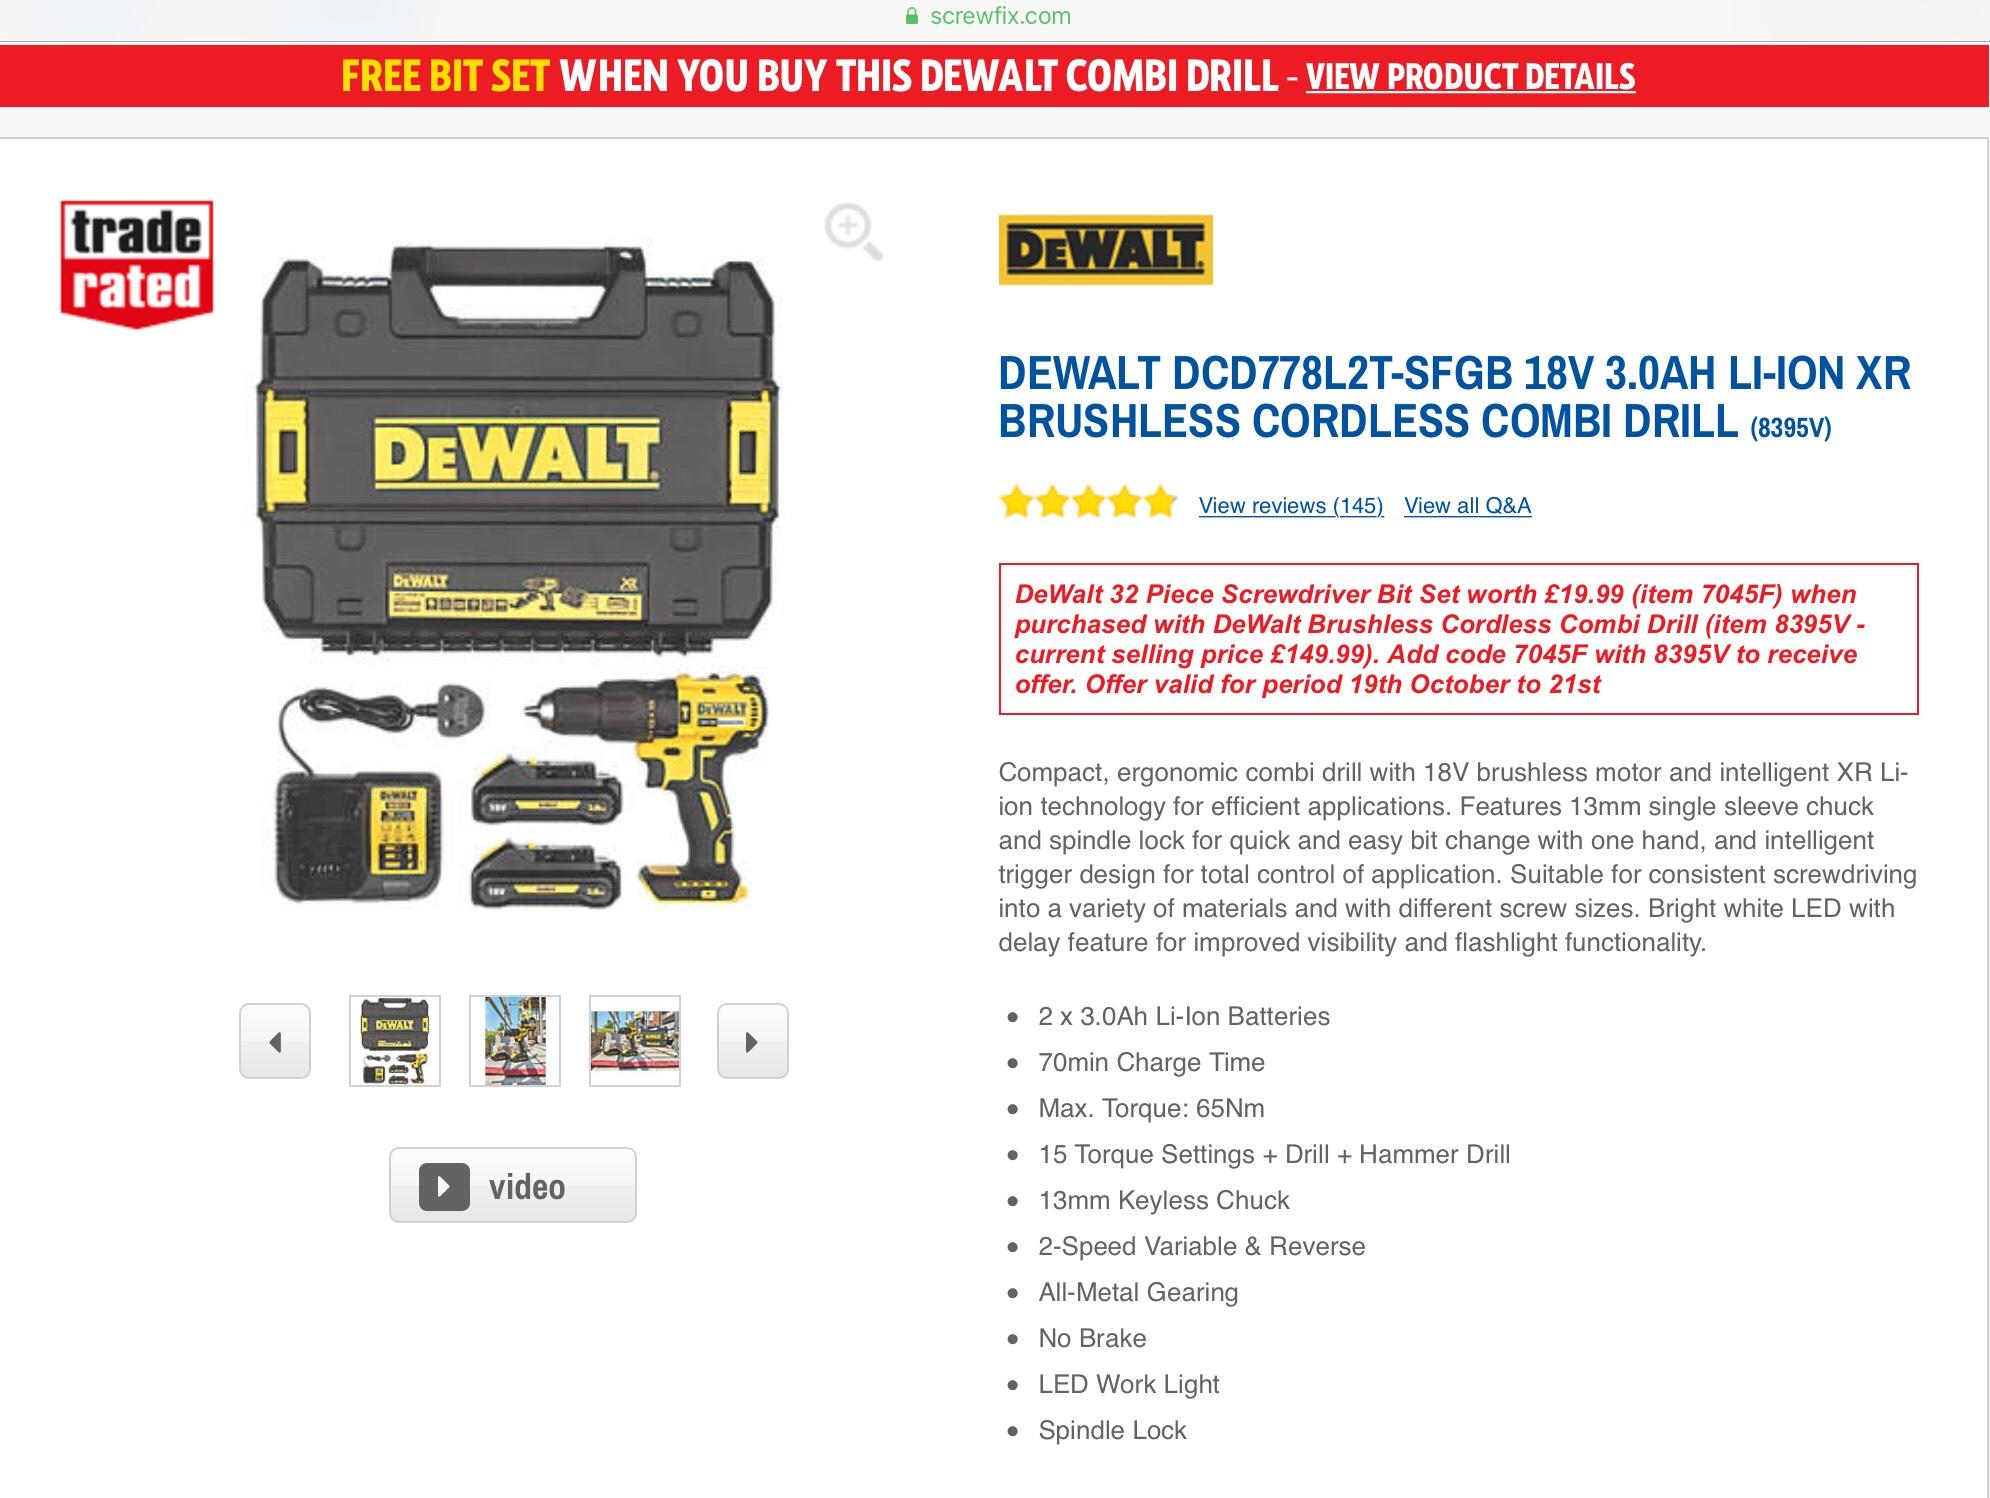 Dewalt DCD778L2T-SFGB 18V 2 x 3.0AH LI-ion Batteries, Free 32 Piece Bit Set, Brushless Combi Drill, Charger & Case £149.99 @ Screwfix C&C